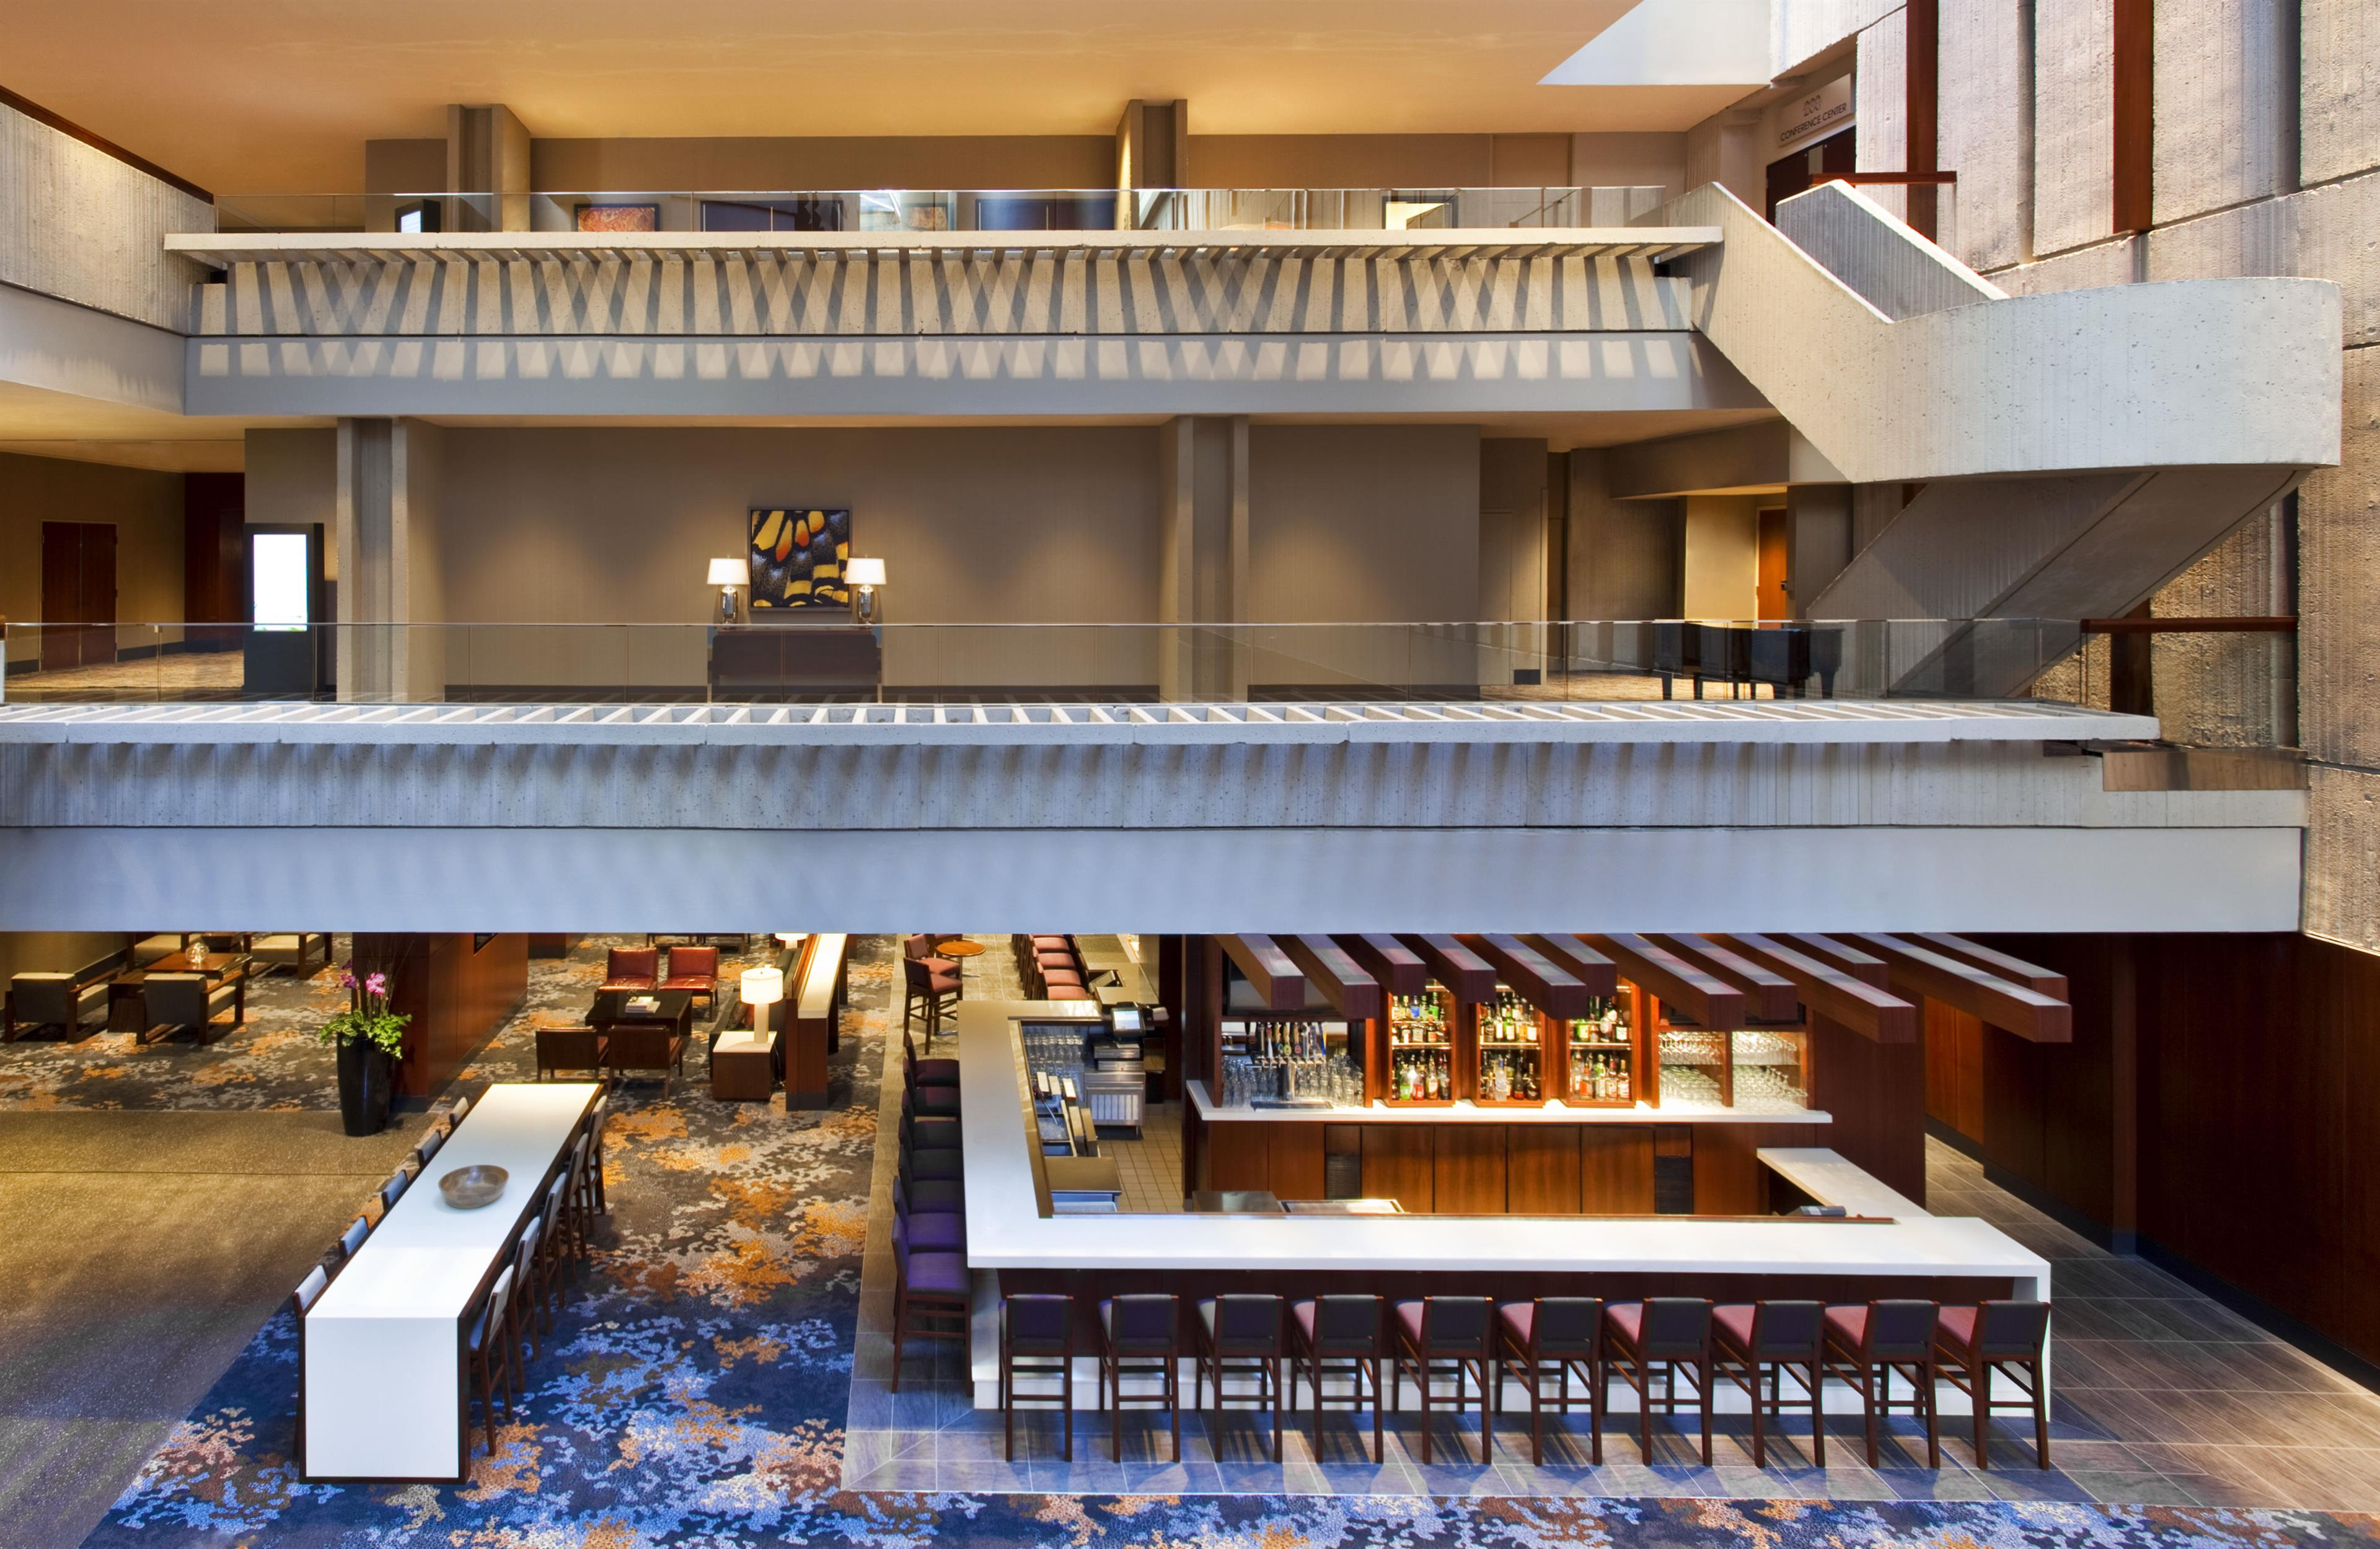 The westin peachtree plaza atlanta in atlanta ga 30303 for Hilton hotels near mercedes benz stadium atlanta